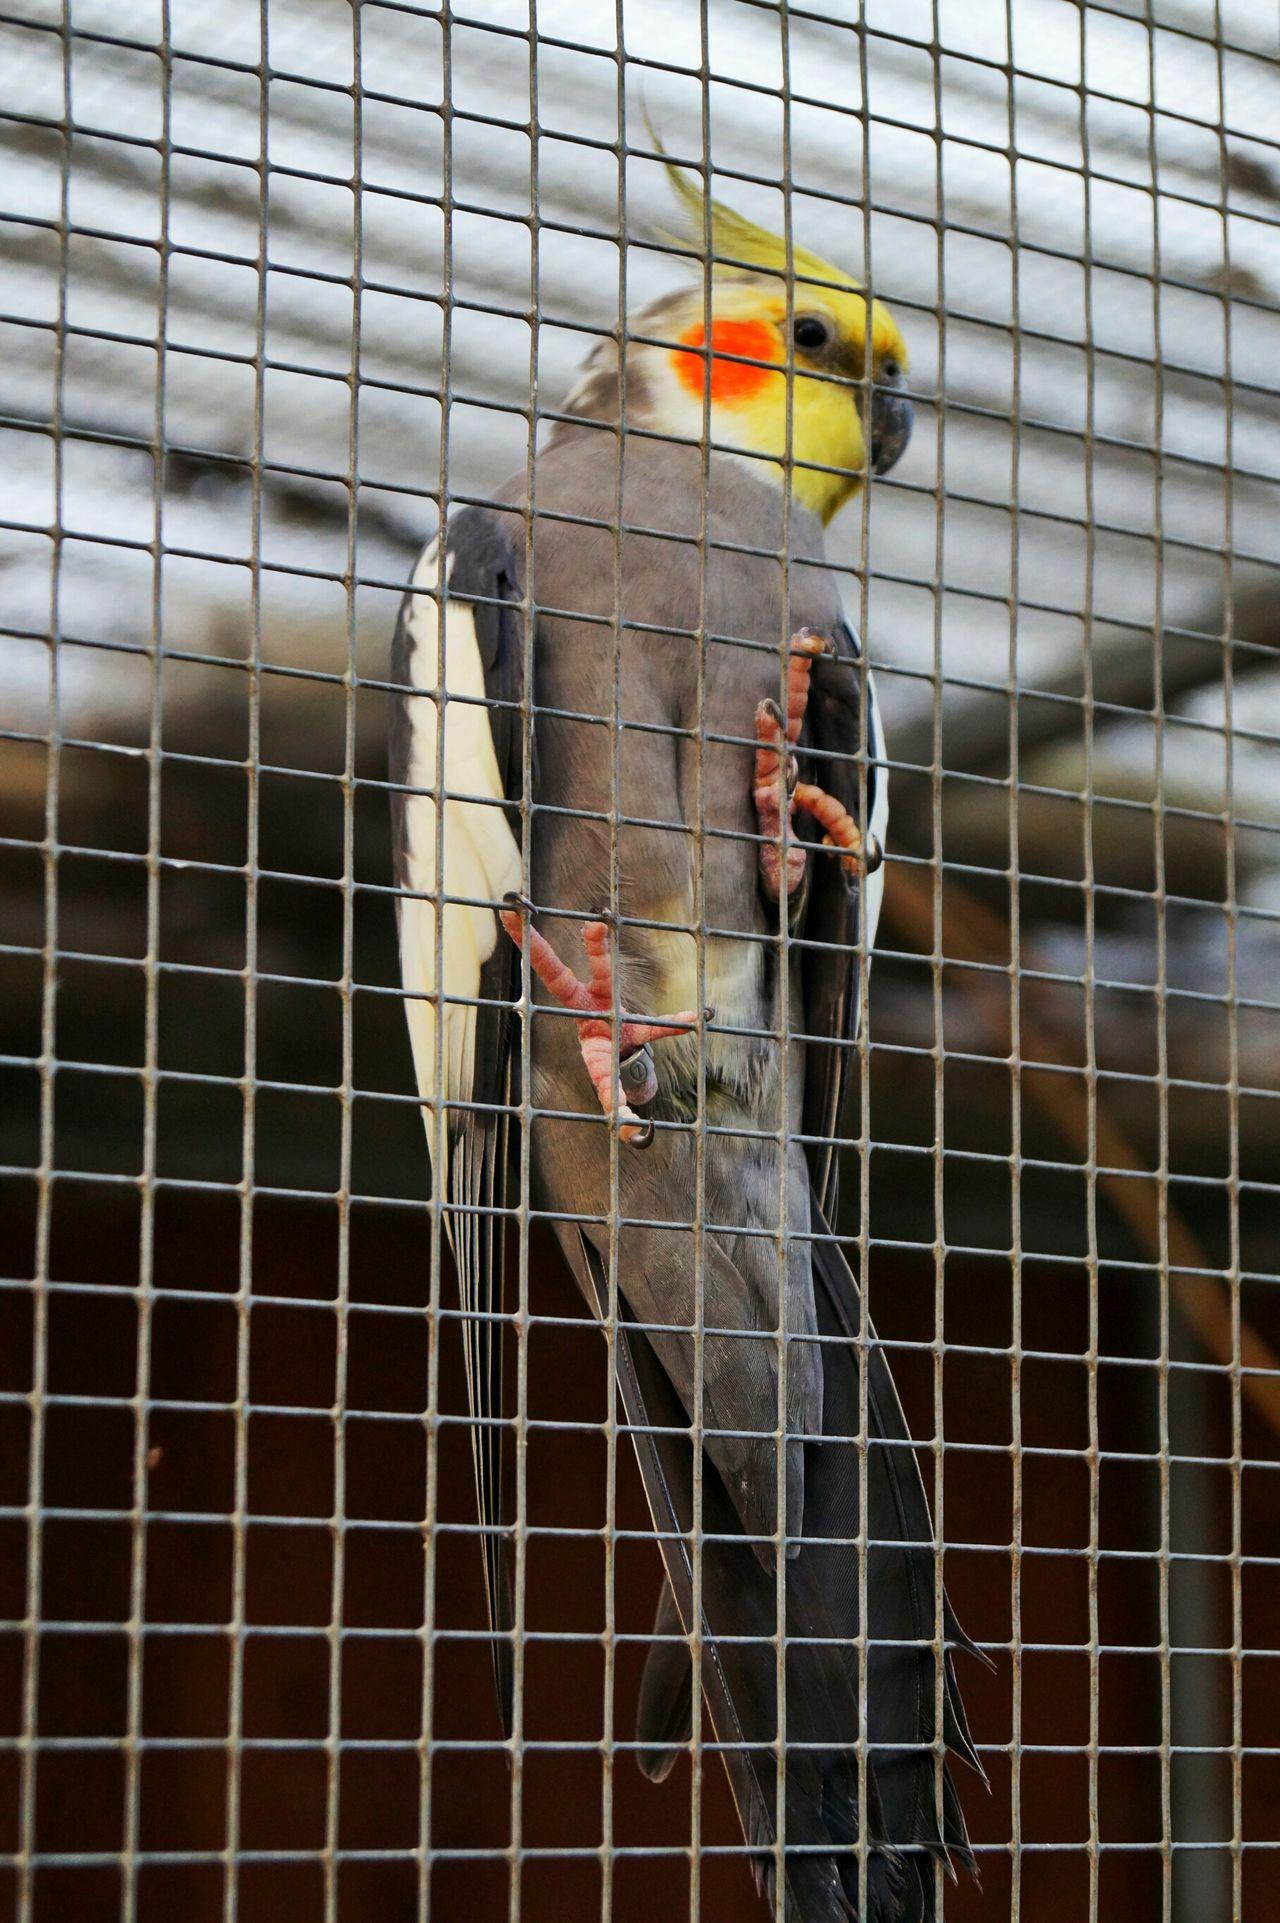 Animal Themes Bird Day No People Nature Weingarten Vogel Vogelpark Outdoors Close-up One Animal Sony Alpha Px58 Draußen